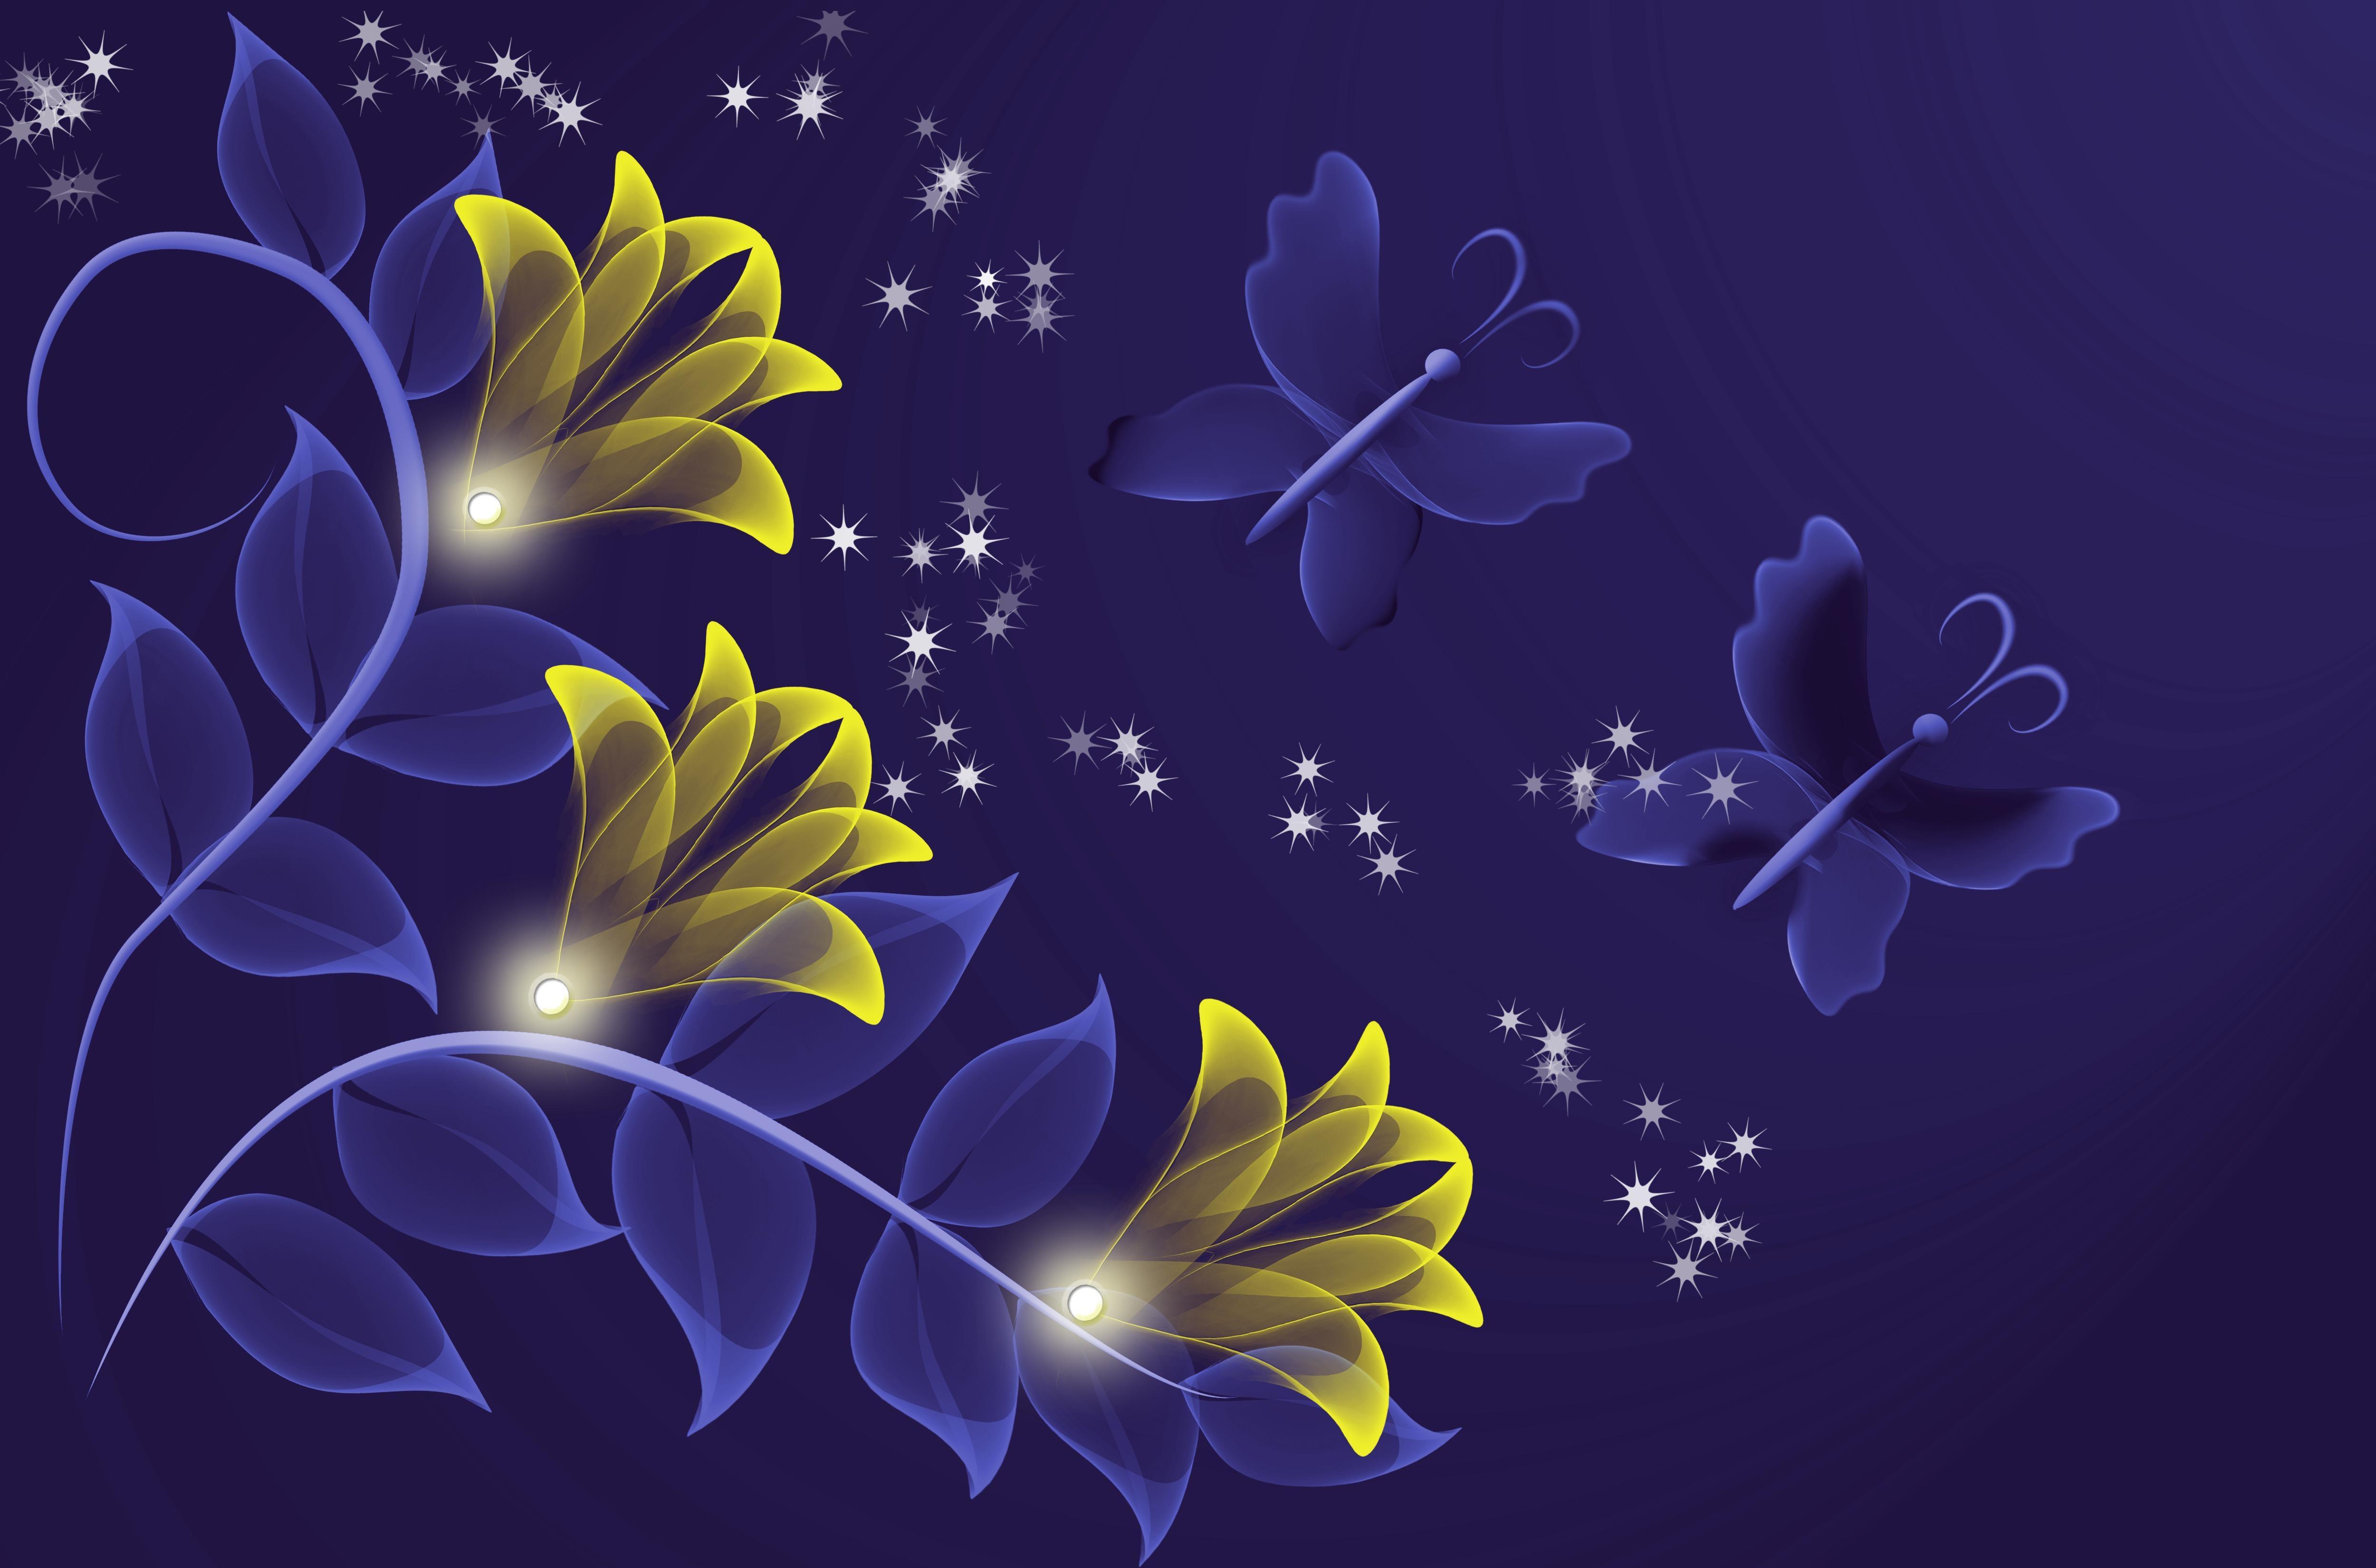 Blue Floral Background Hd